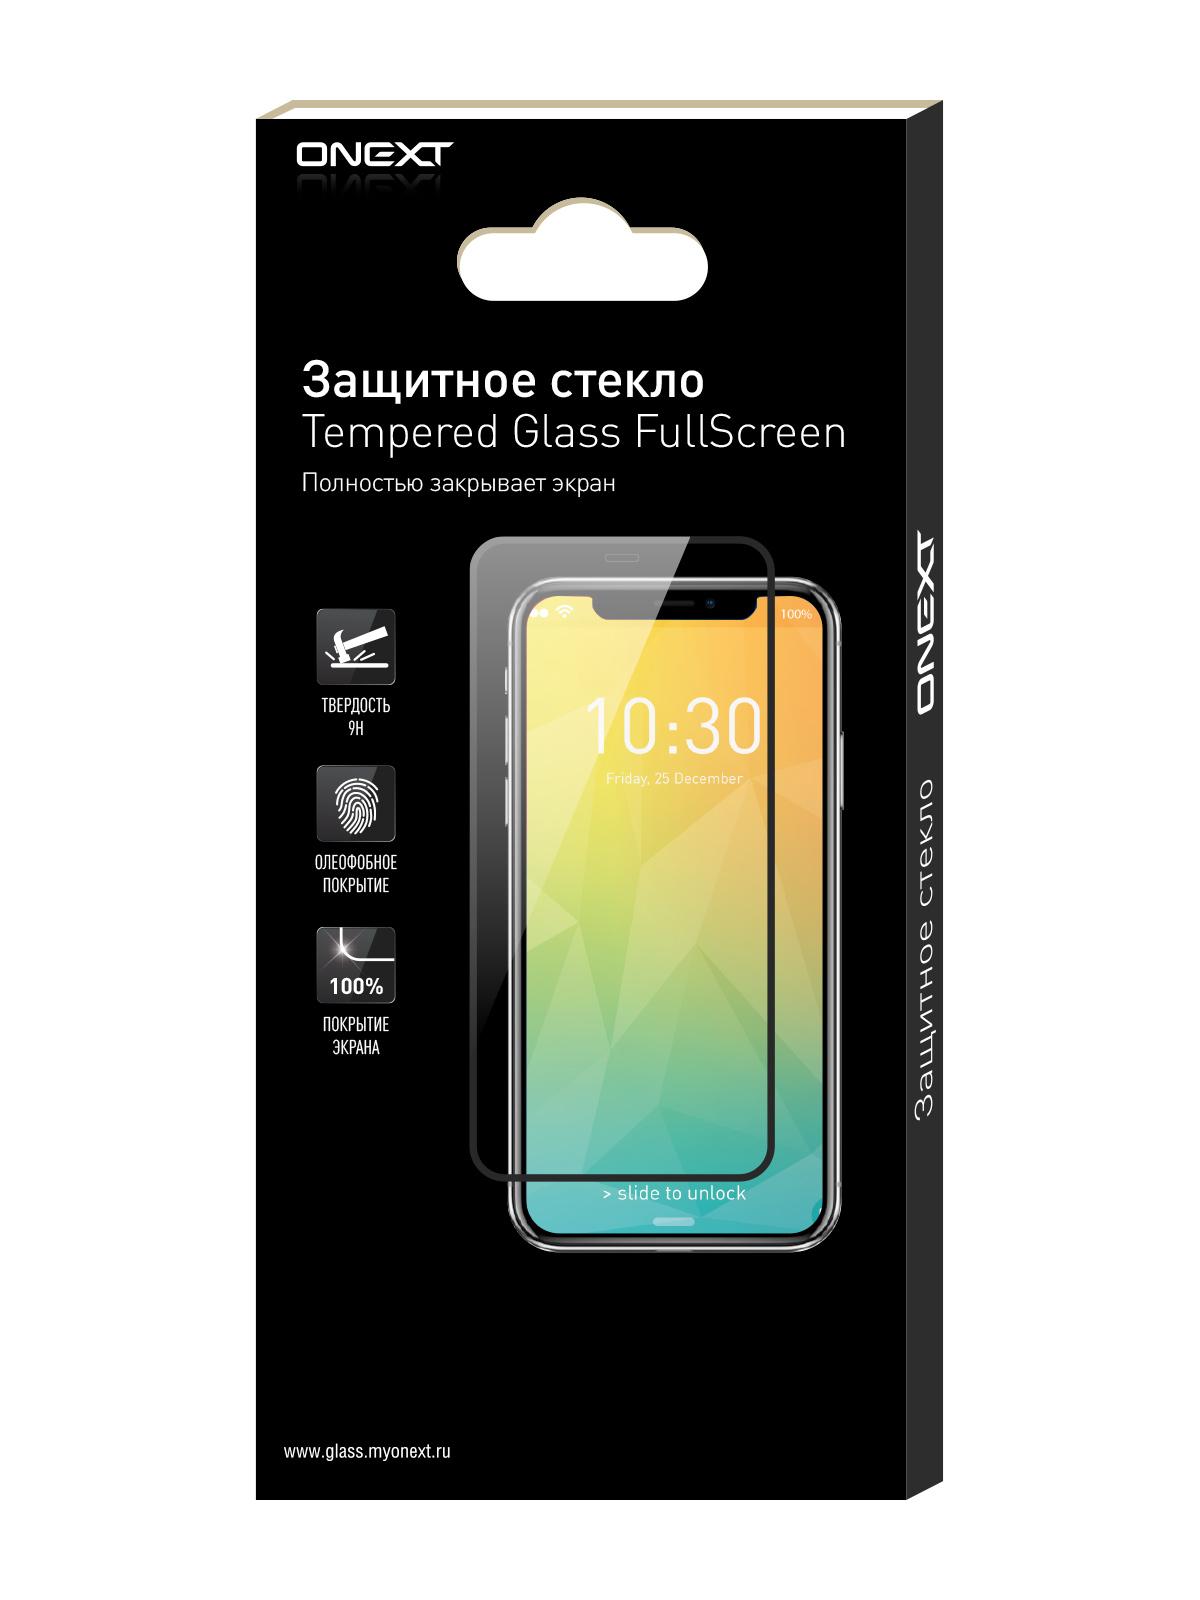 Защитное стекло ONEXT для Xiaomi Mi 5S Plus Black